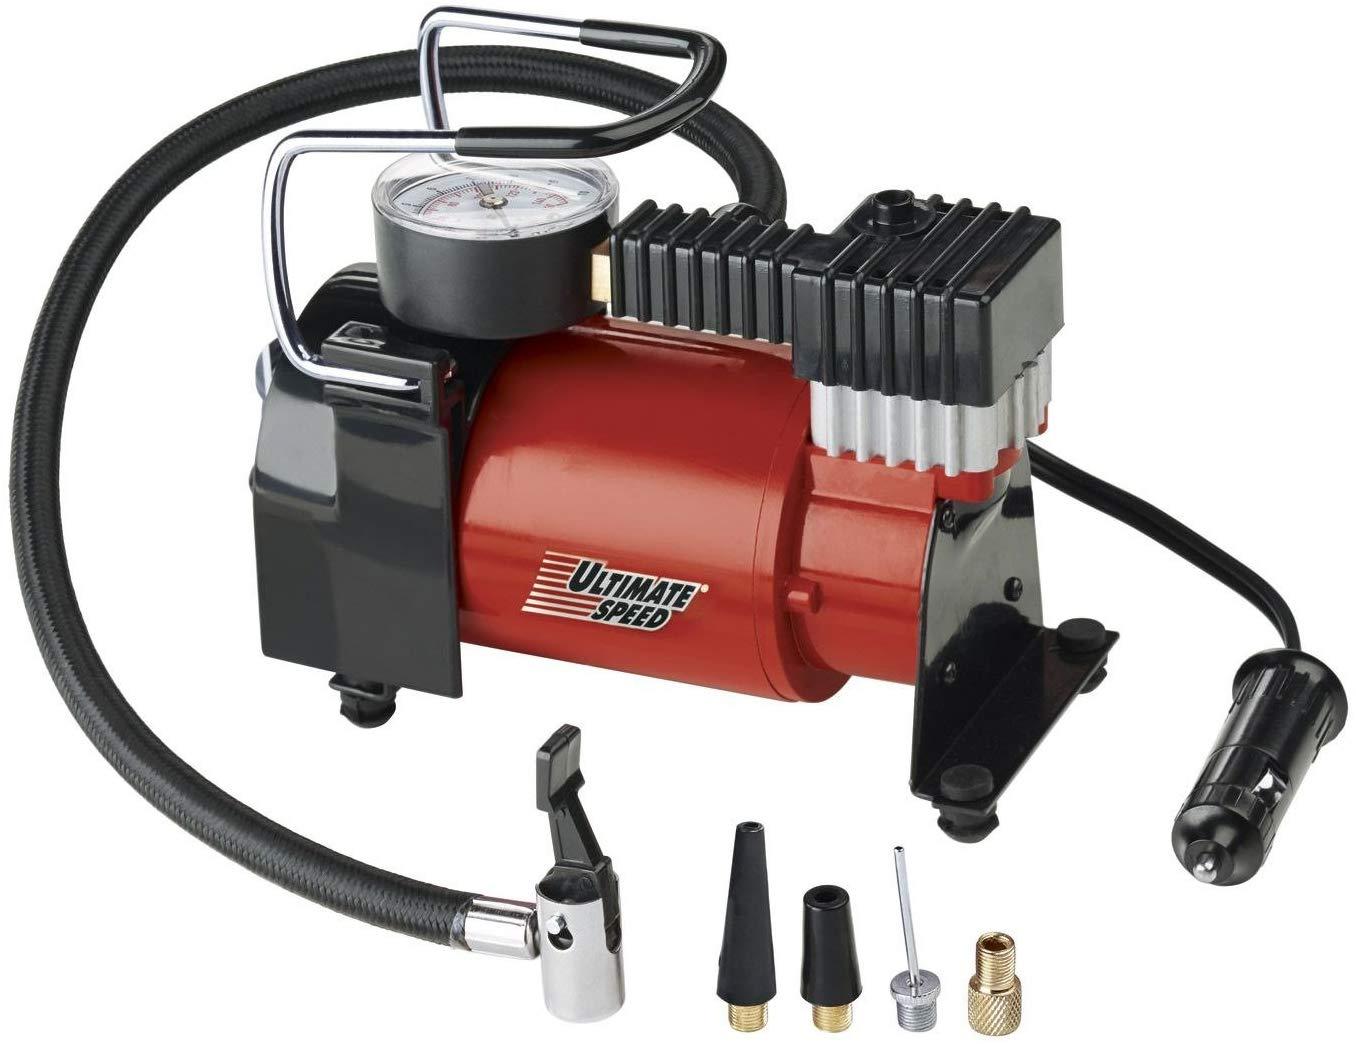 Car/cycle/other tyre compressor pump: Ultimate Speed Mini Compressor UMK10 C2 - Lidl £12.99